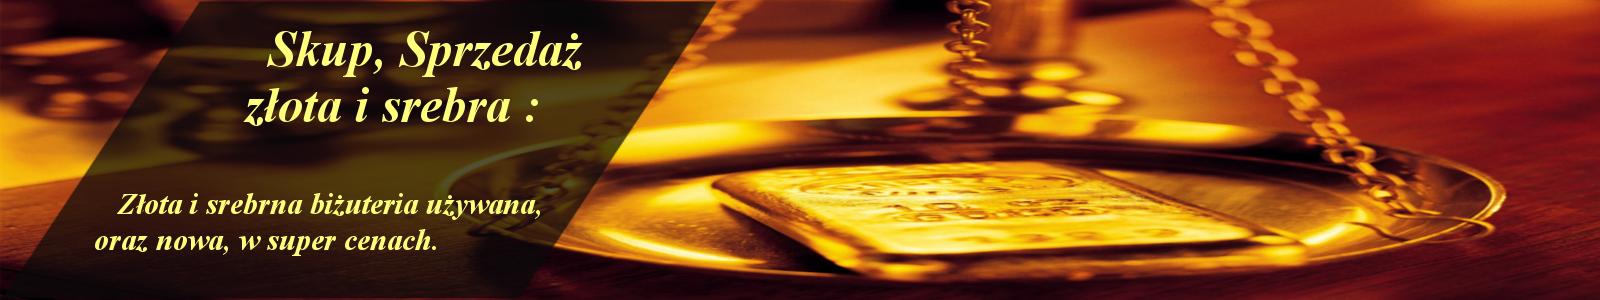 Lombard Cena skupu złota Legnica